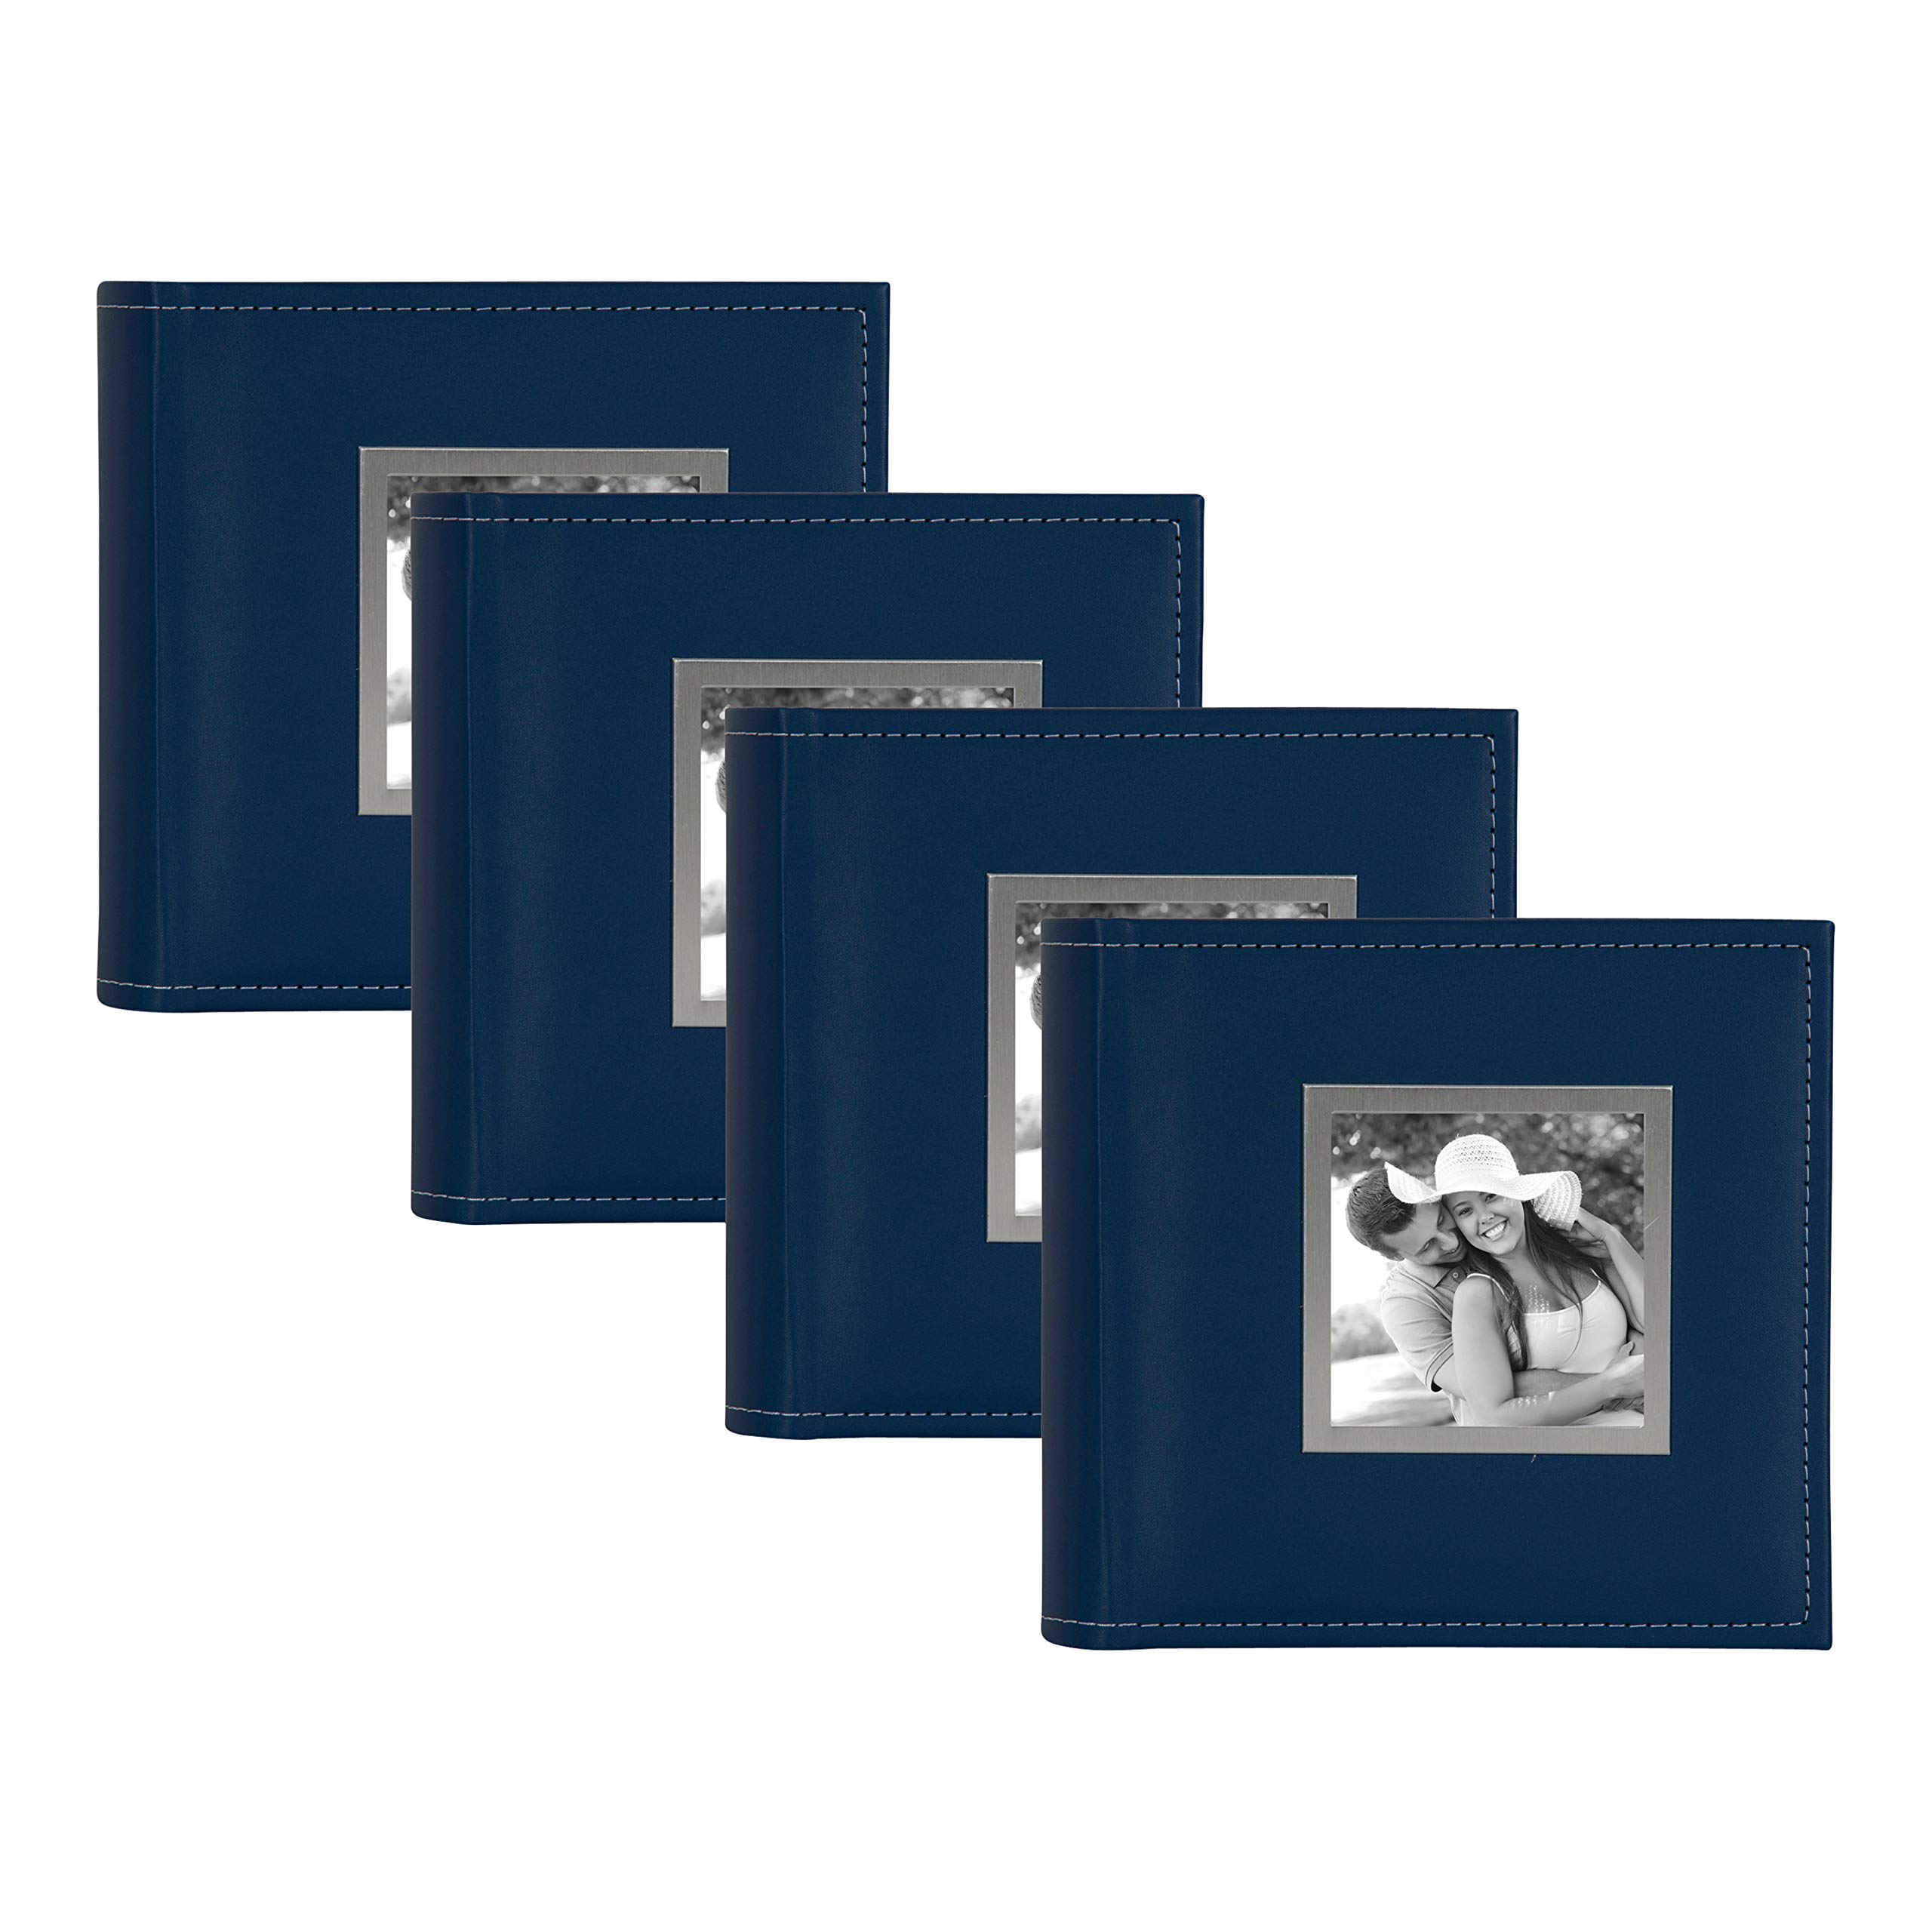 DesignOvation Sleek Faux Leather Navy Blue Photo Album, Holds 100 4x6 Photos, Set of 4 by DesignOvation